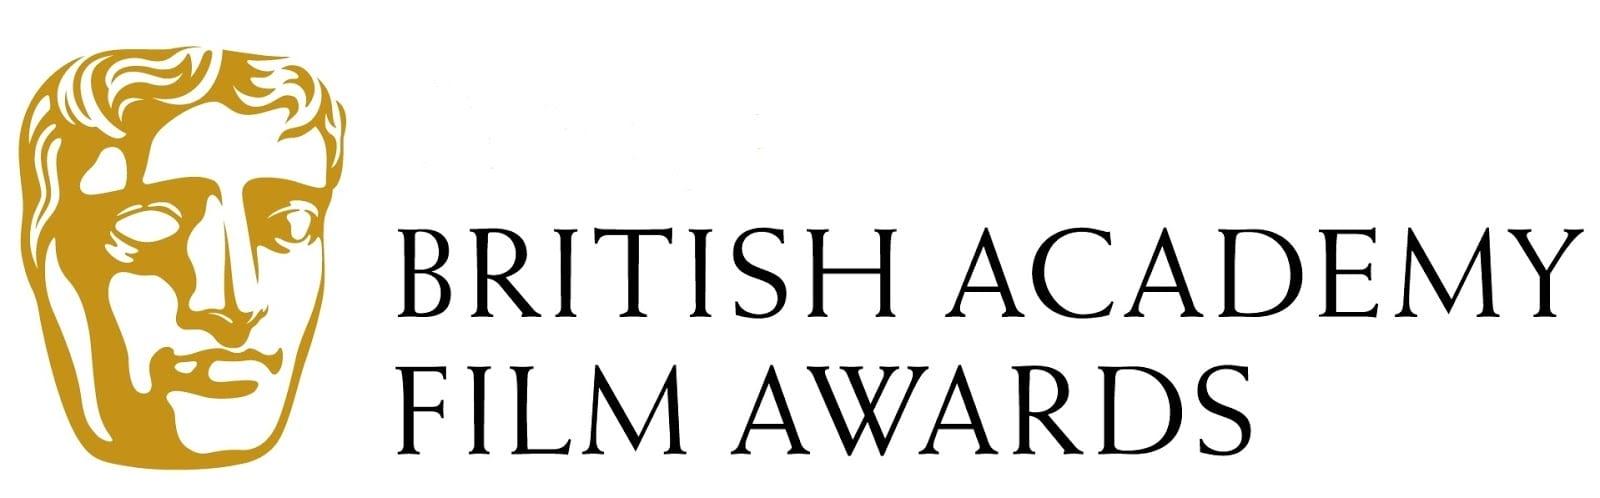 66th British Academy Film Awards M-Net Premiere M-Net 11 February